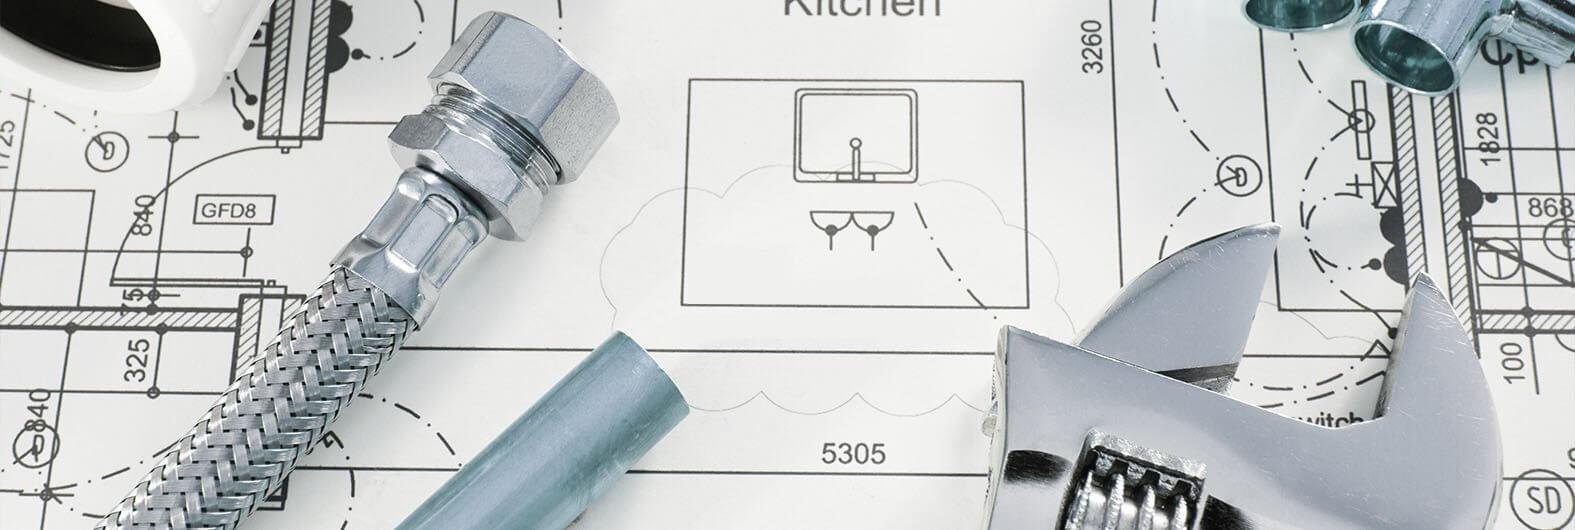 camrose ab plumbing drawing in diy plumbers slider consulting contractors looking services kenegmech